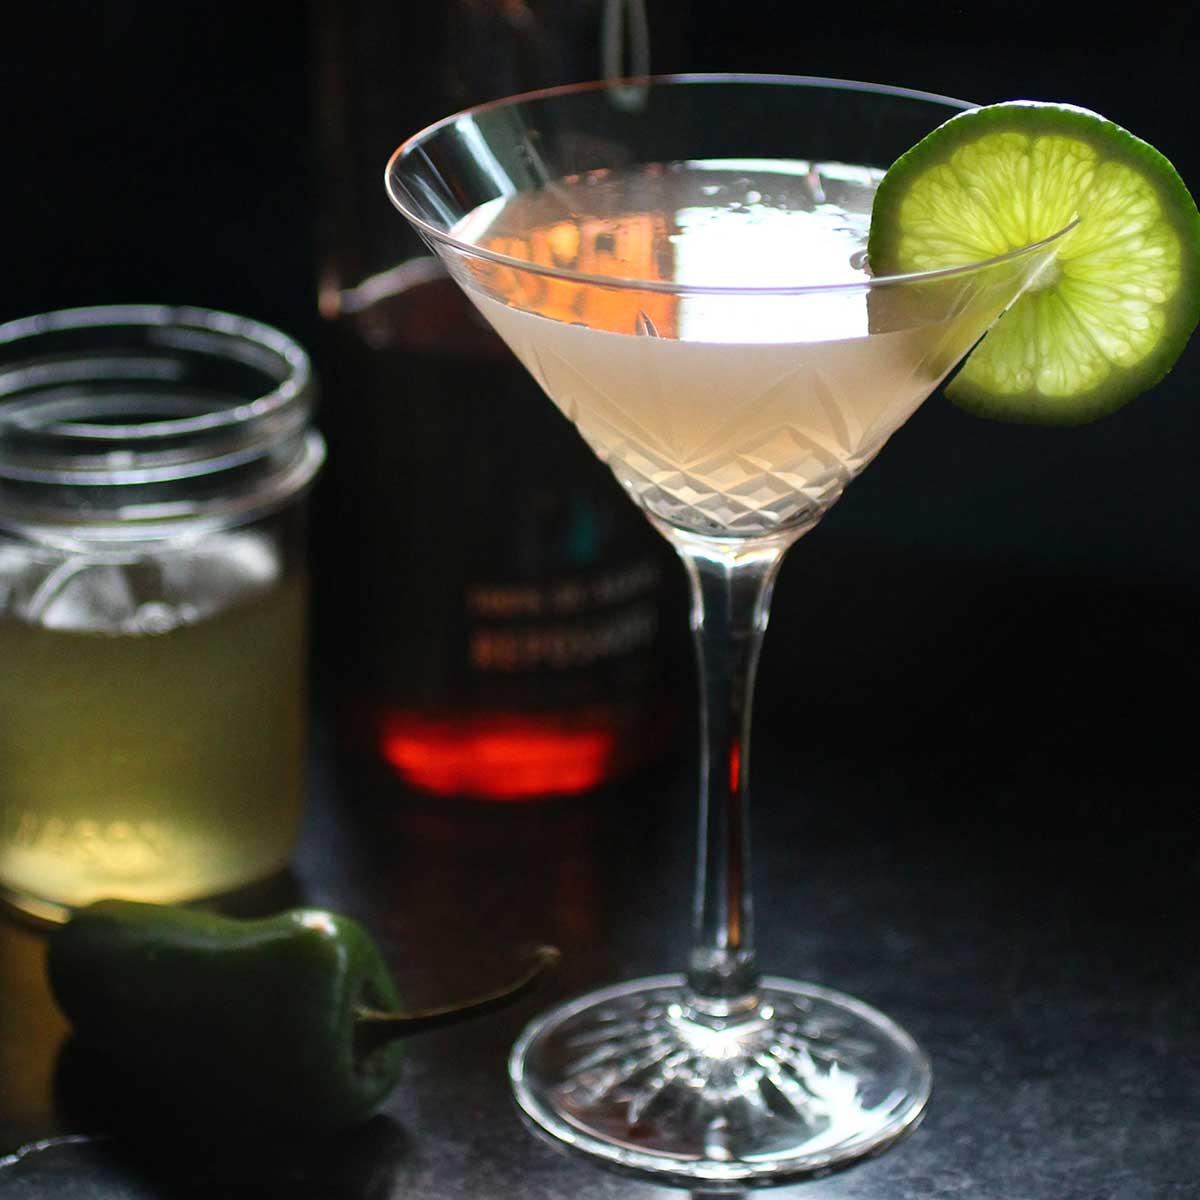 Jalapeño Lime Tequila cocktail